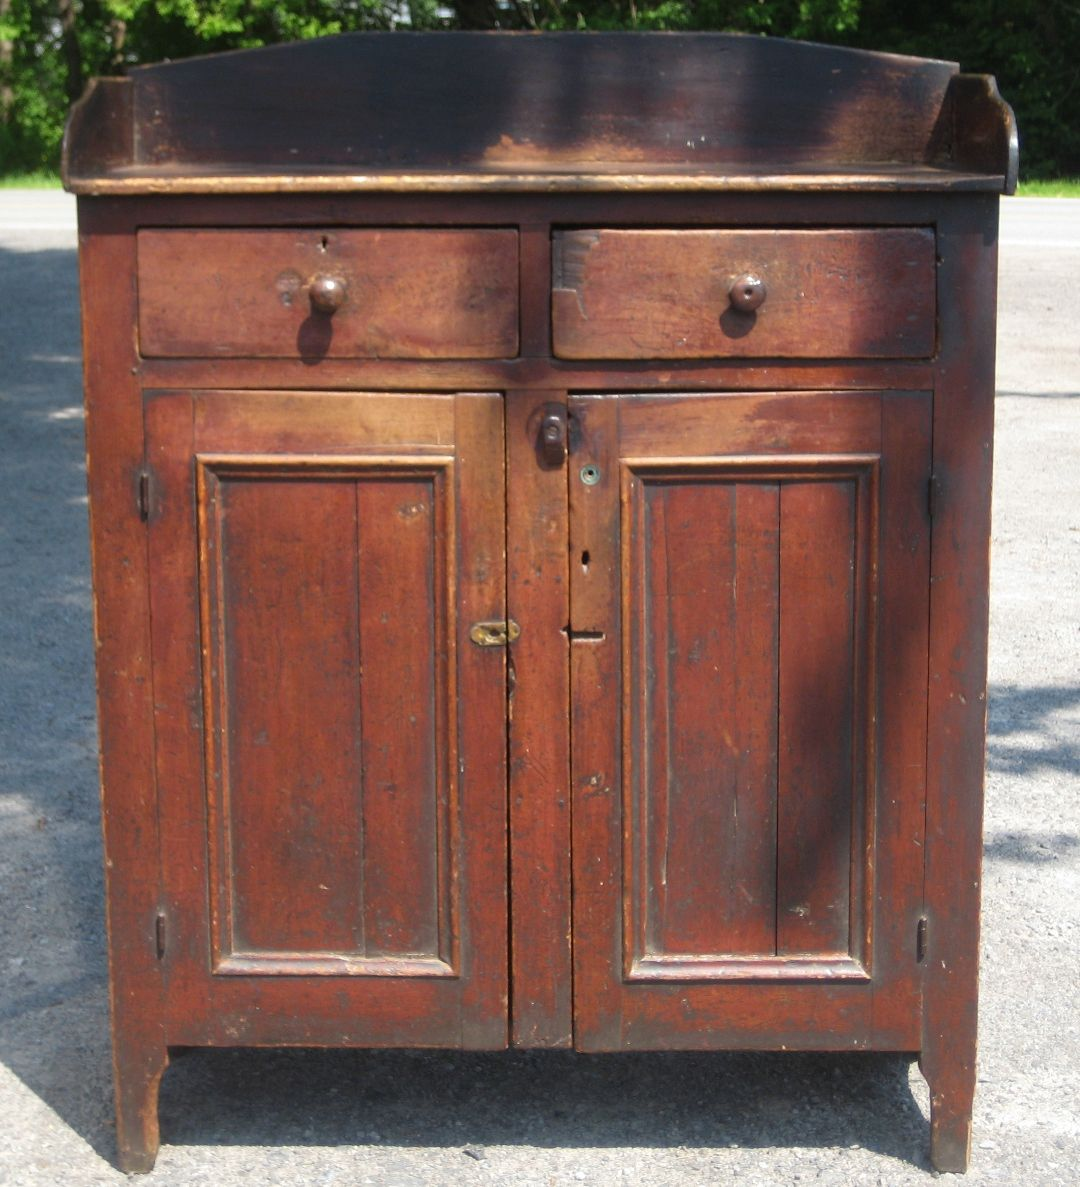 19th century Pennsylvania jelly cupboard Jelly cupboard